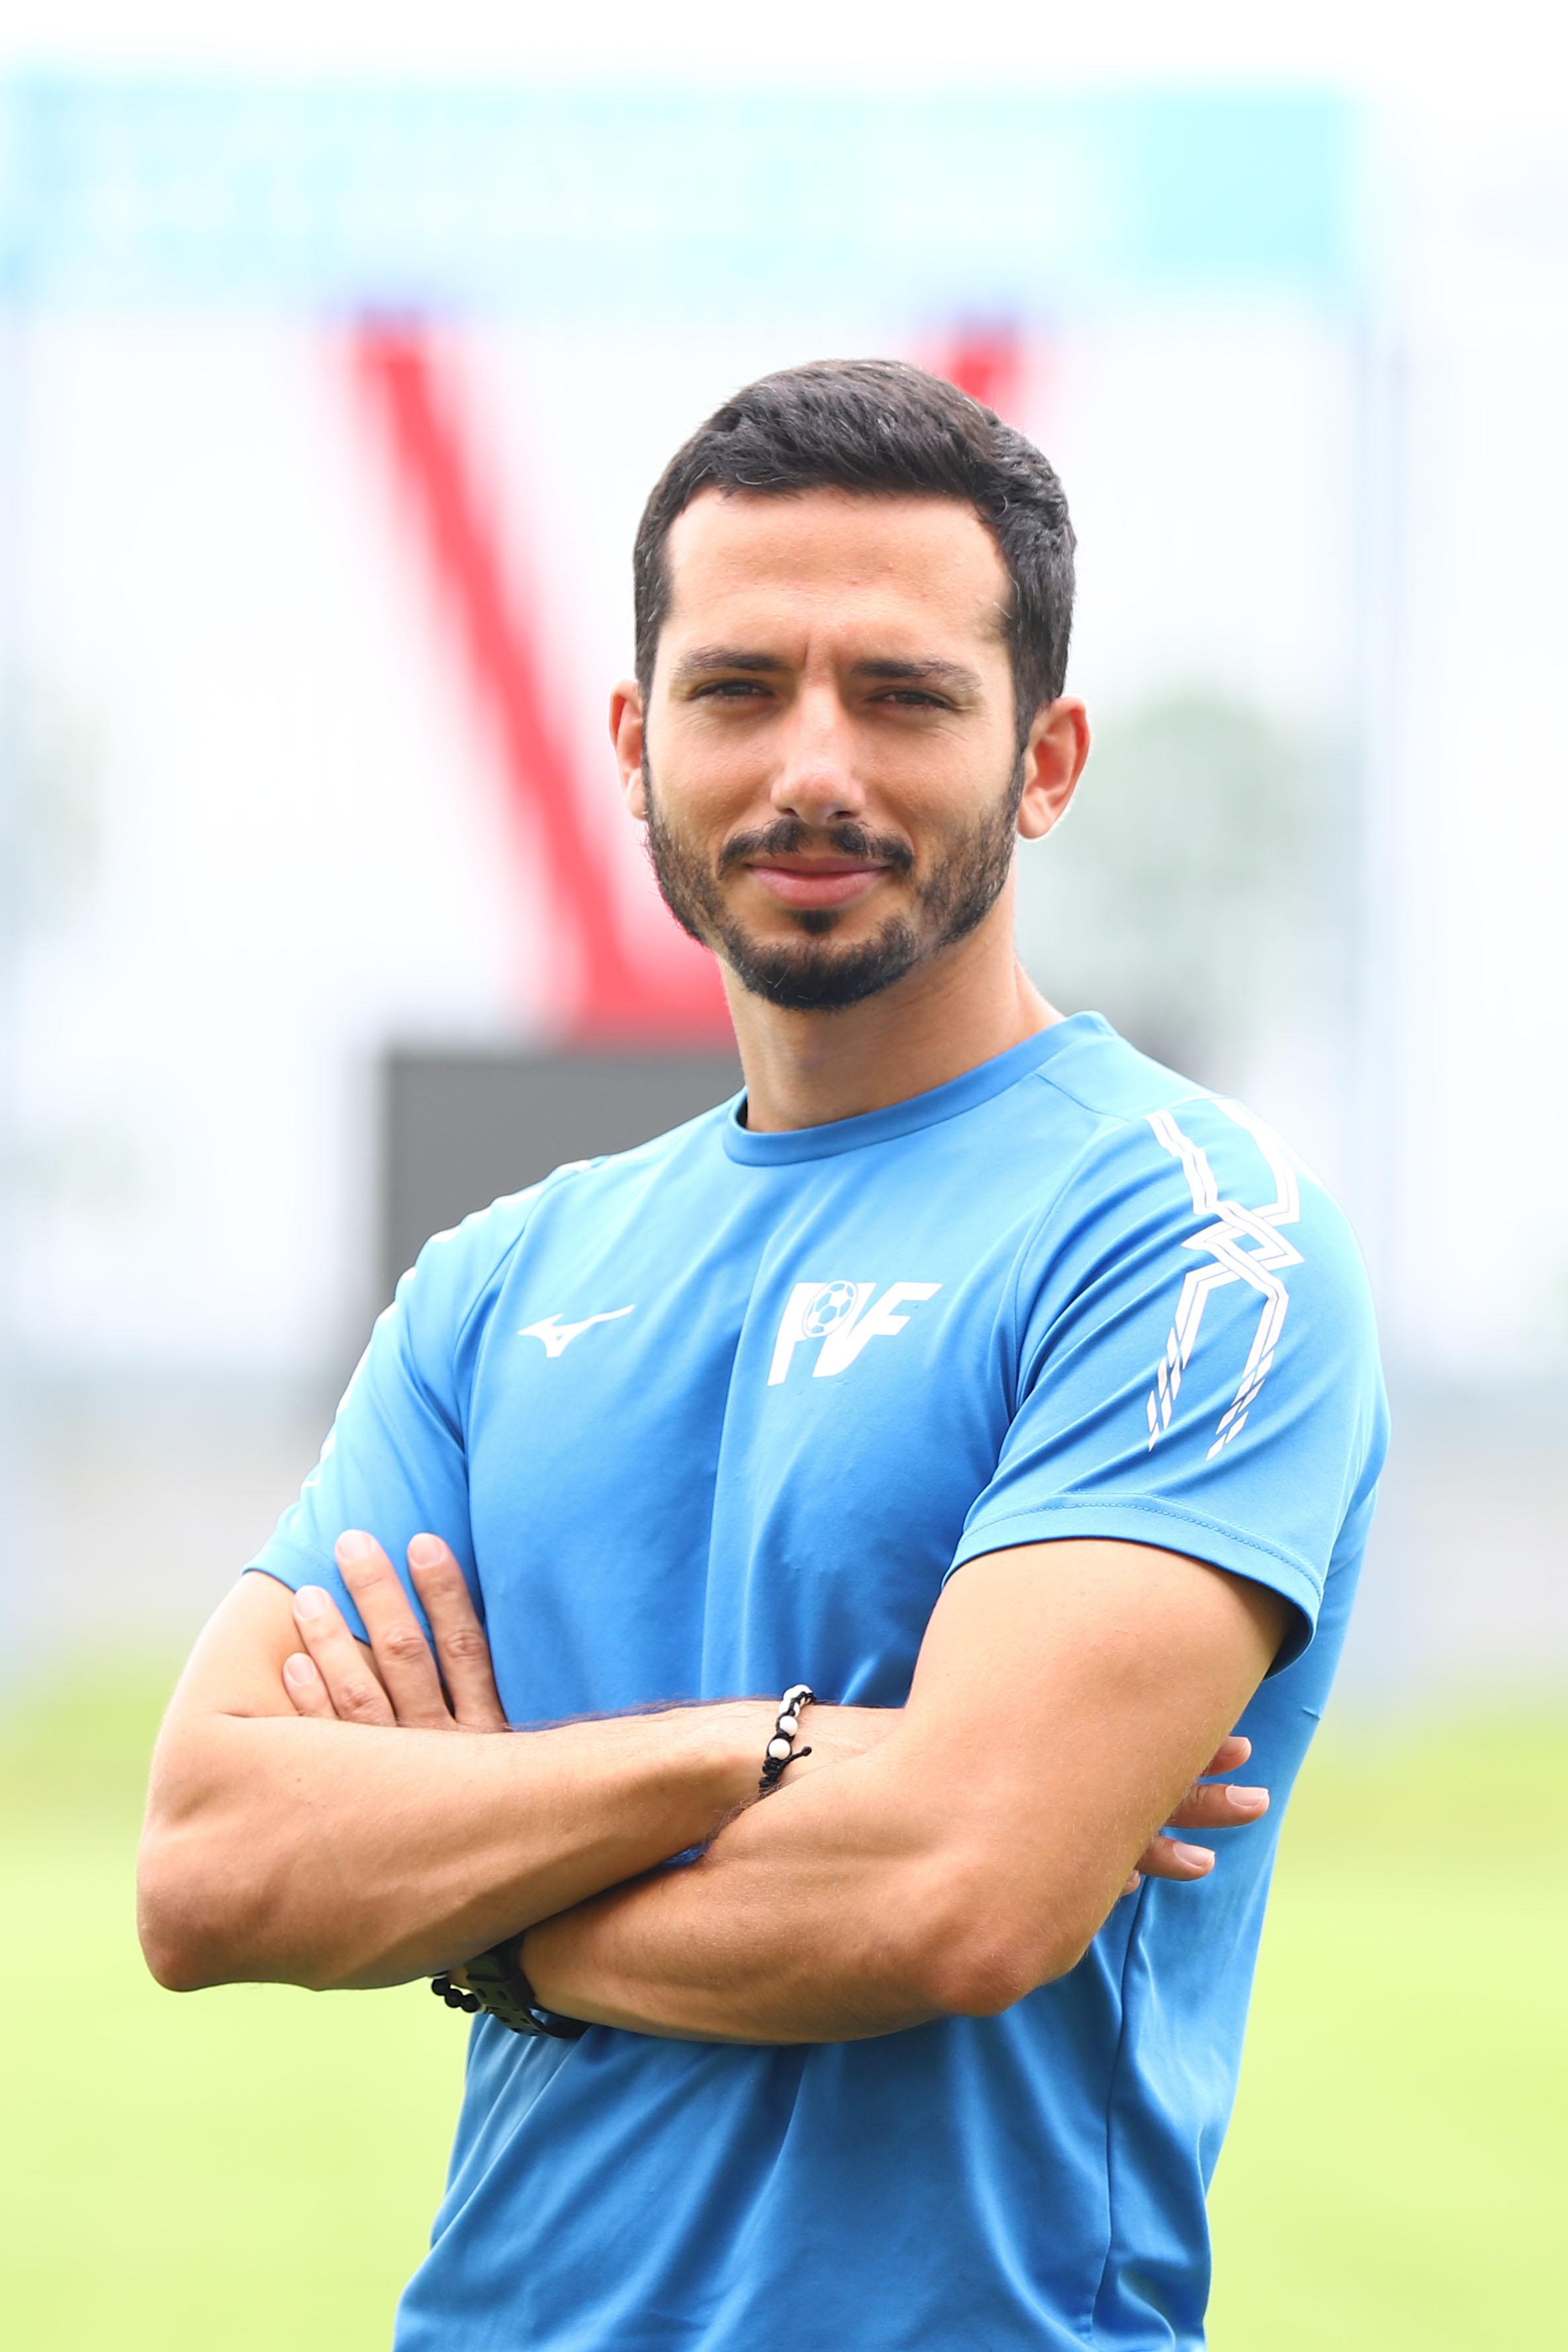 Mauro Jeronimo Tavares